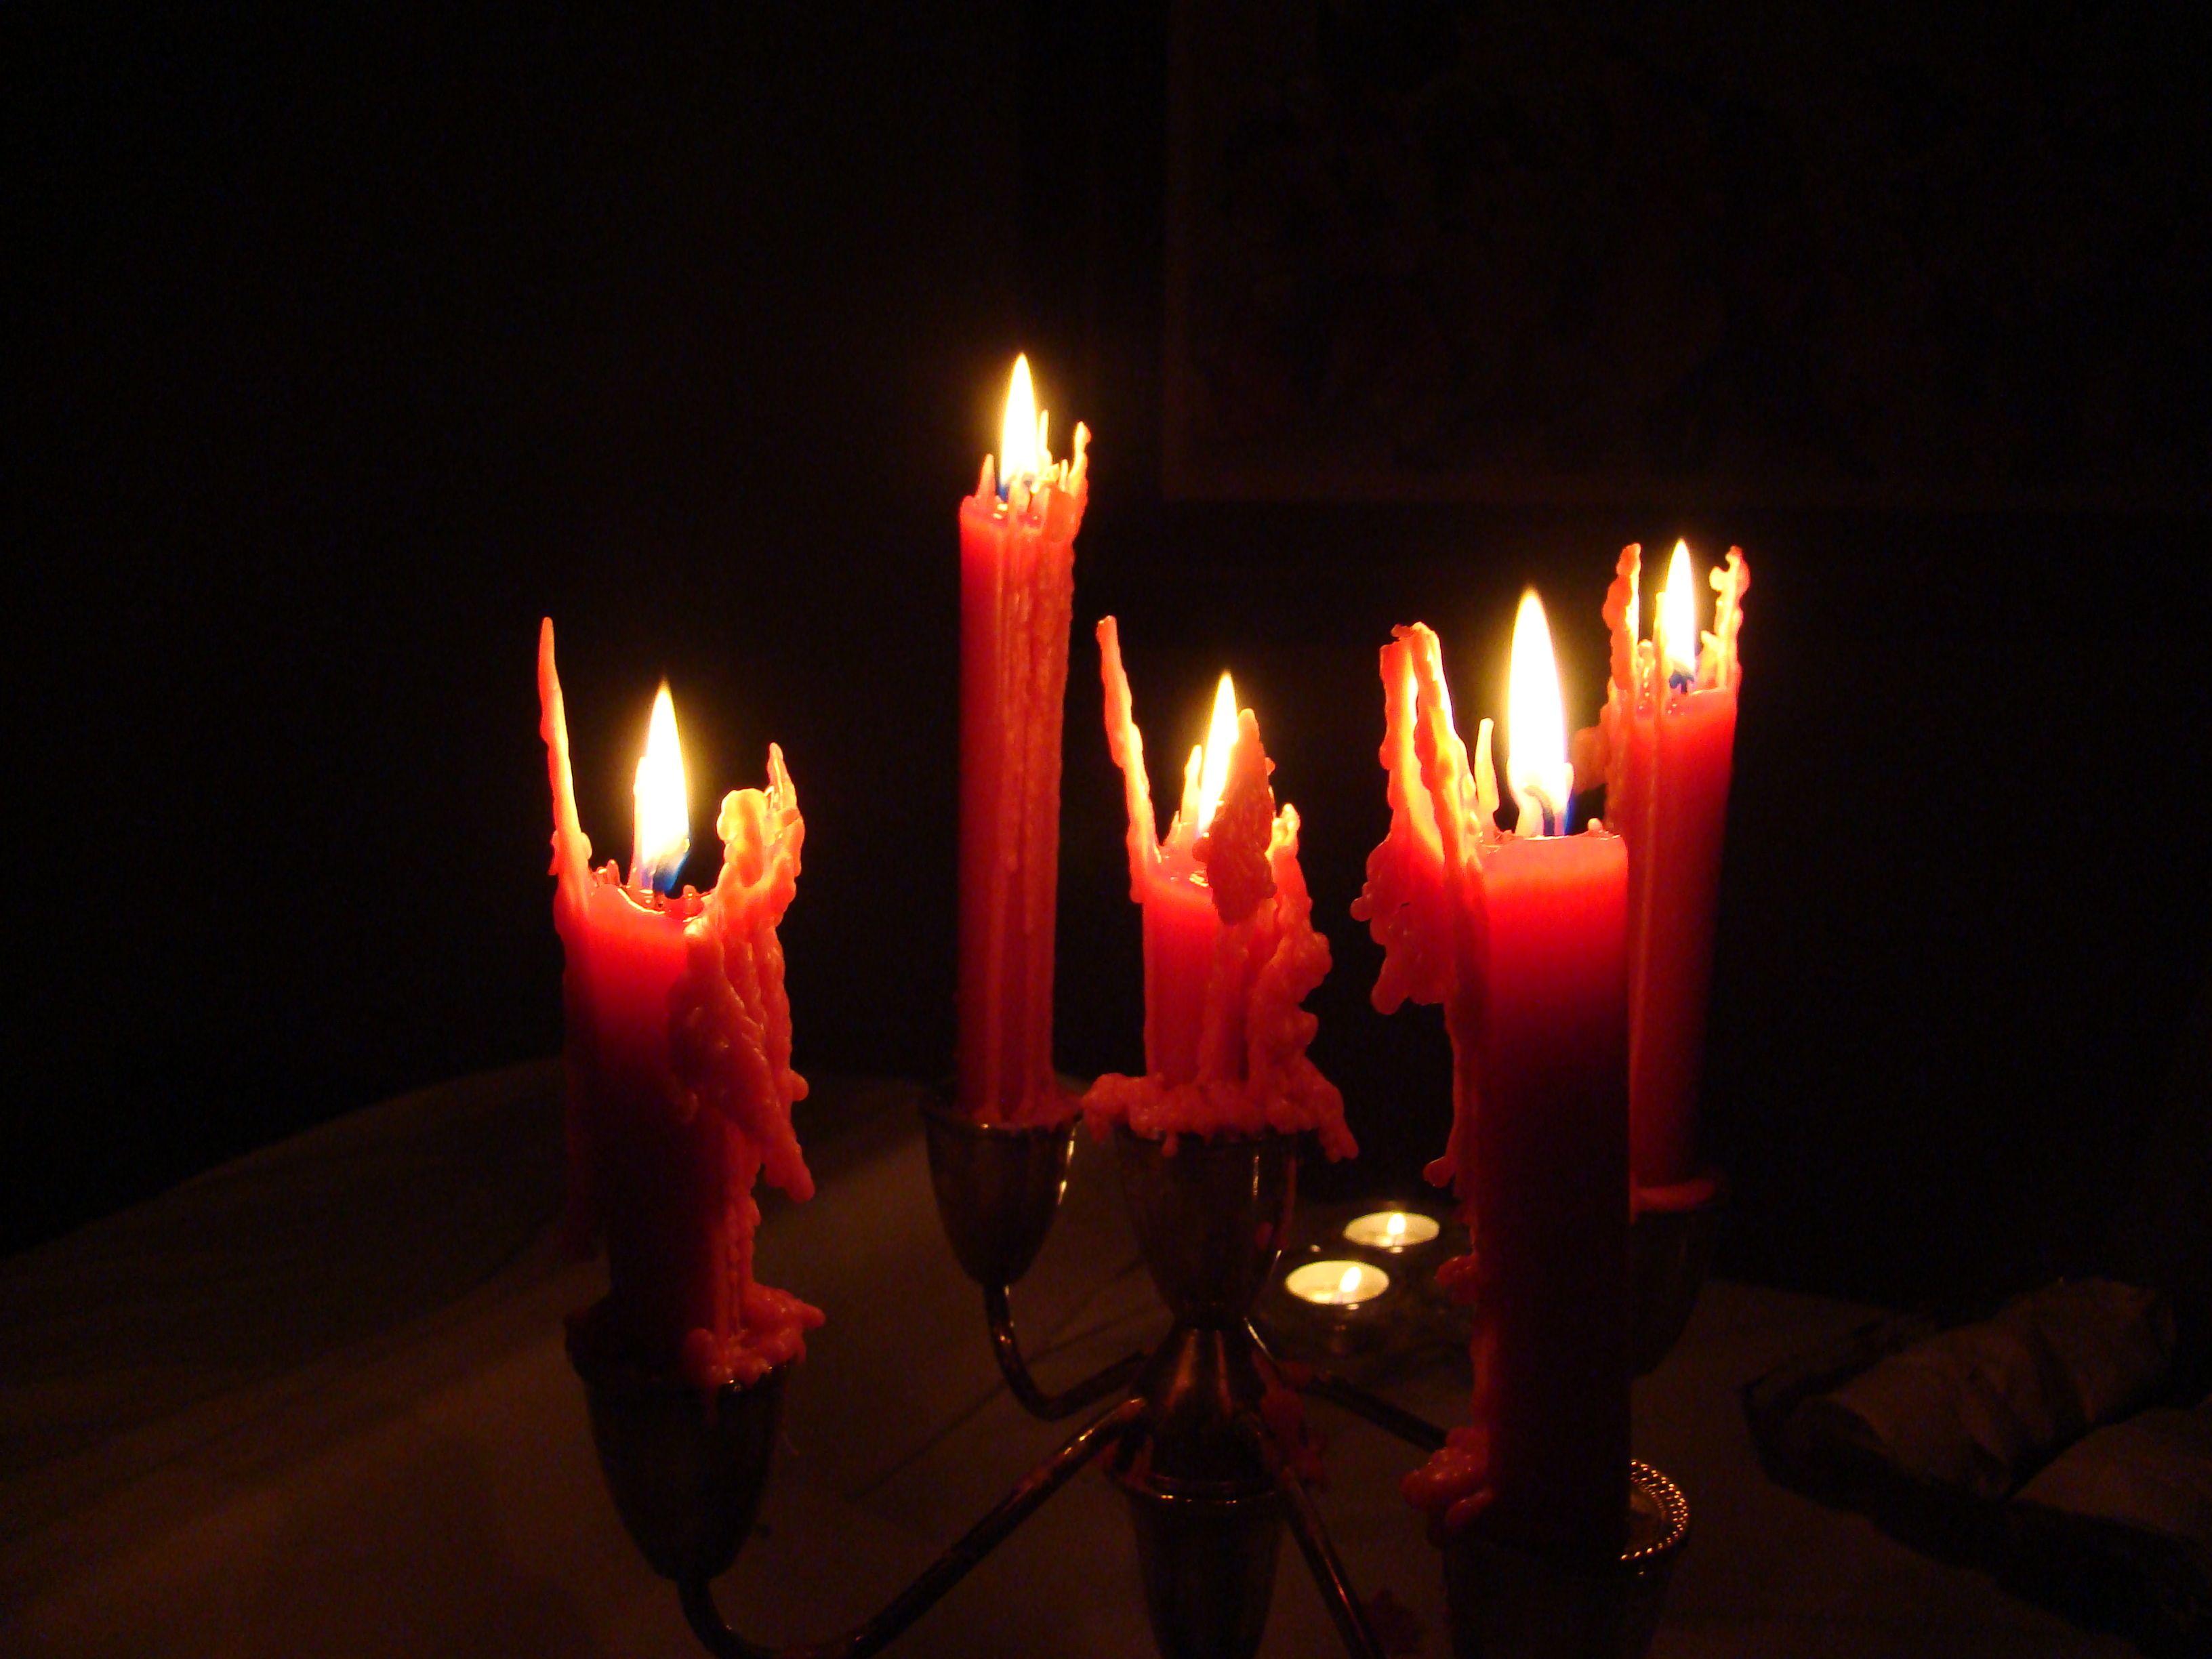 spooky halloween candles dark - Halloween Candles